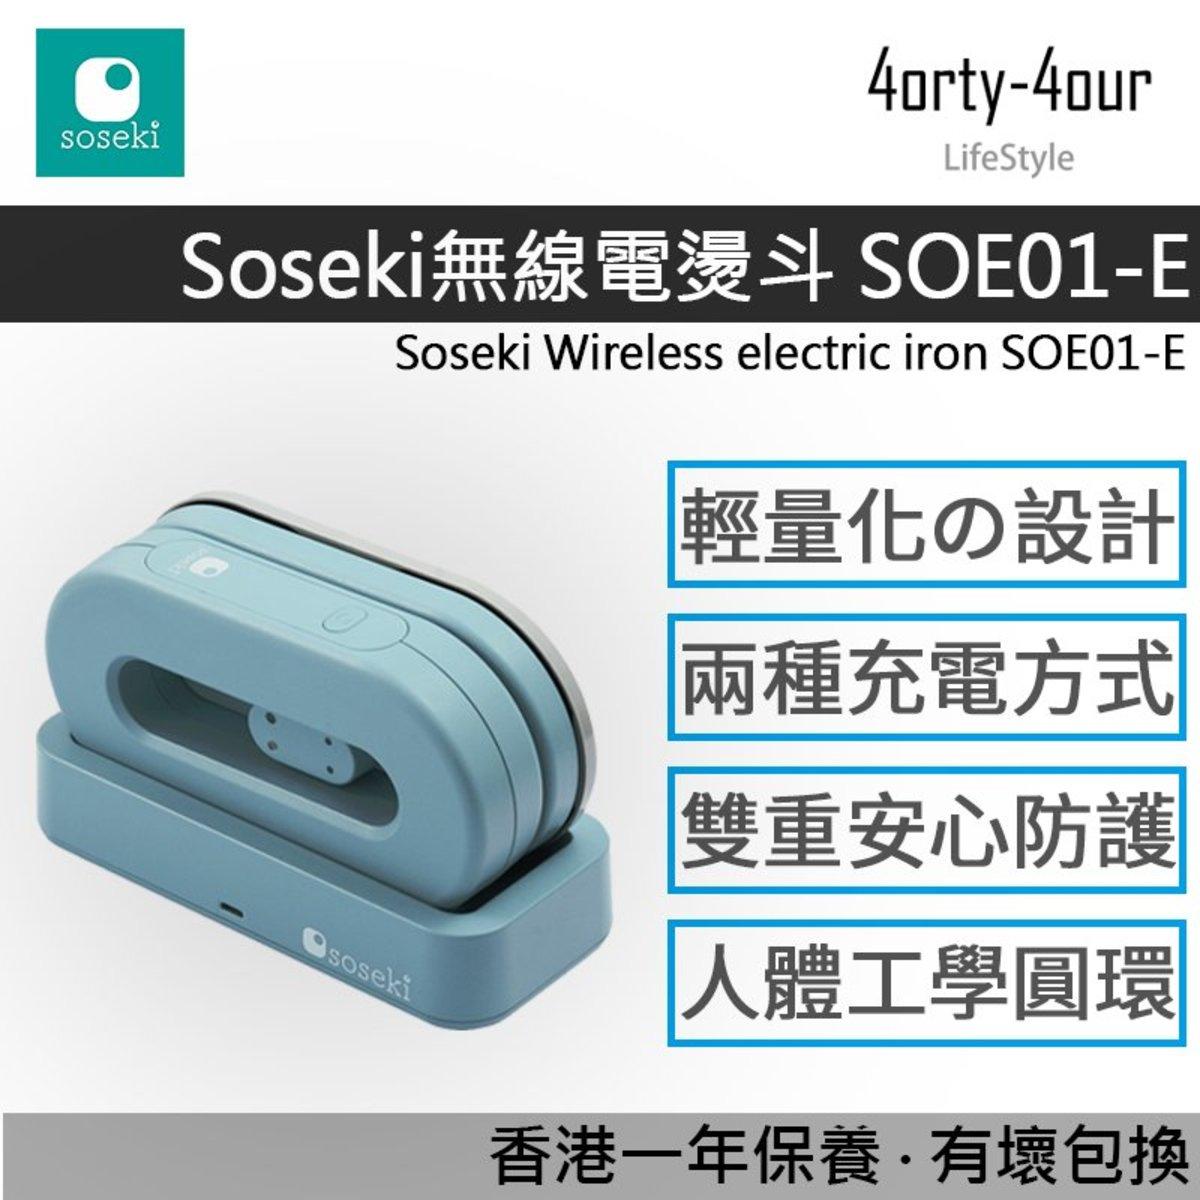 Soseki 無線電燙斗 SOE01-E Blue - 便攜式 安全 人體工學